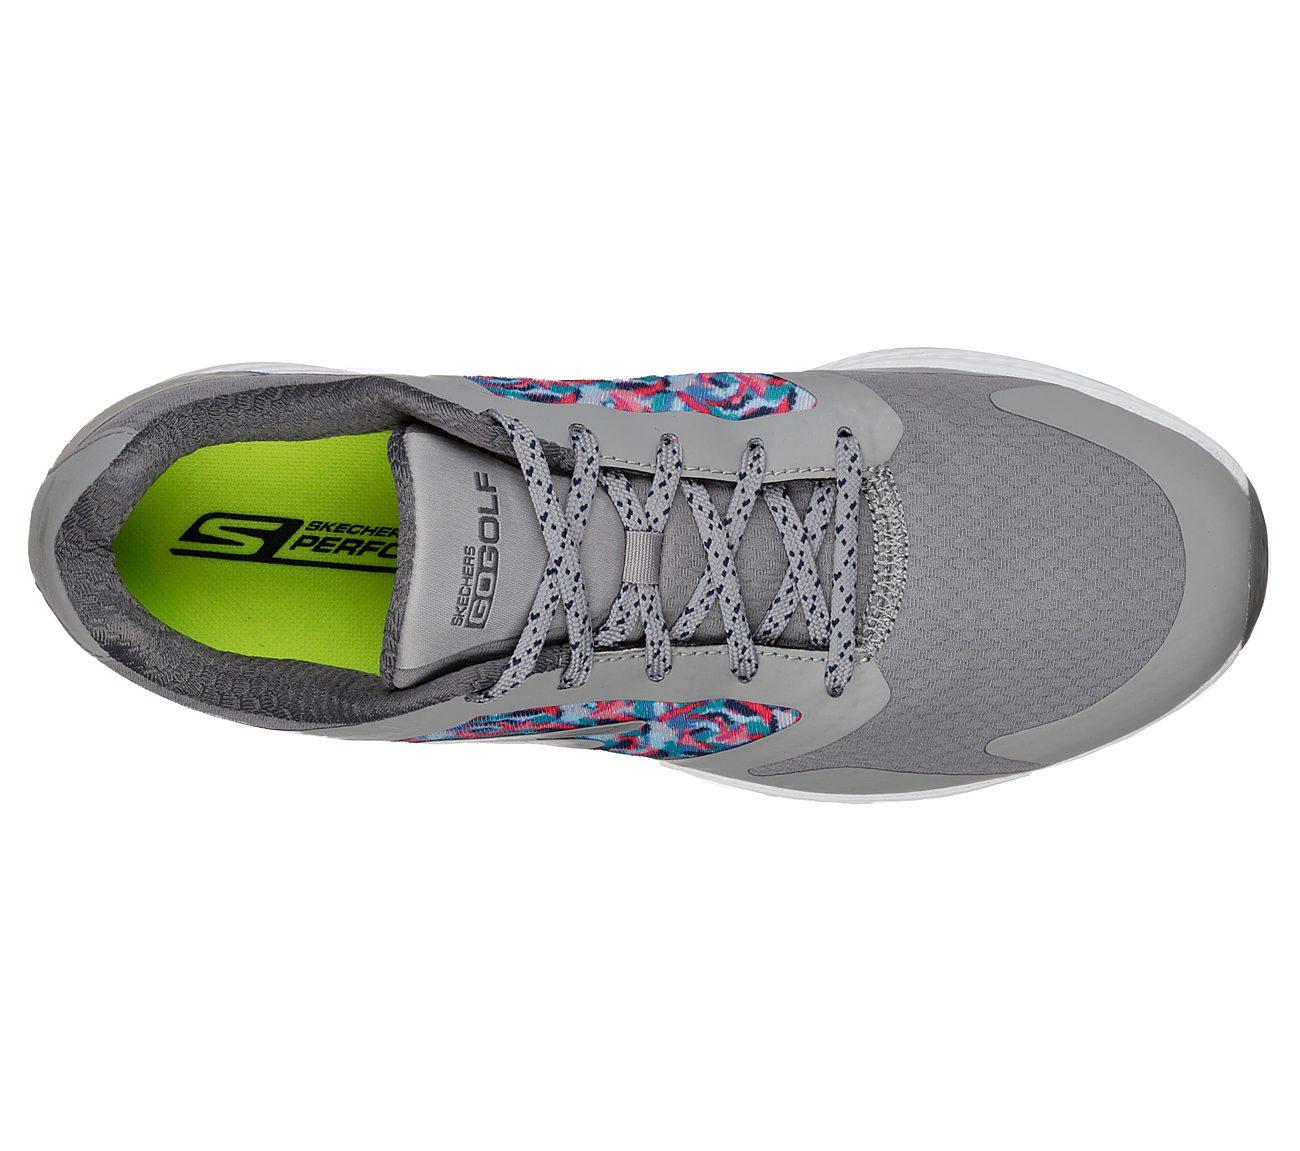 Skechers Women's Go Golf Eagle Golf Shoe - Grey